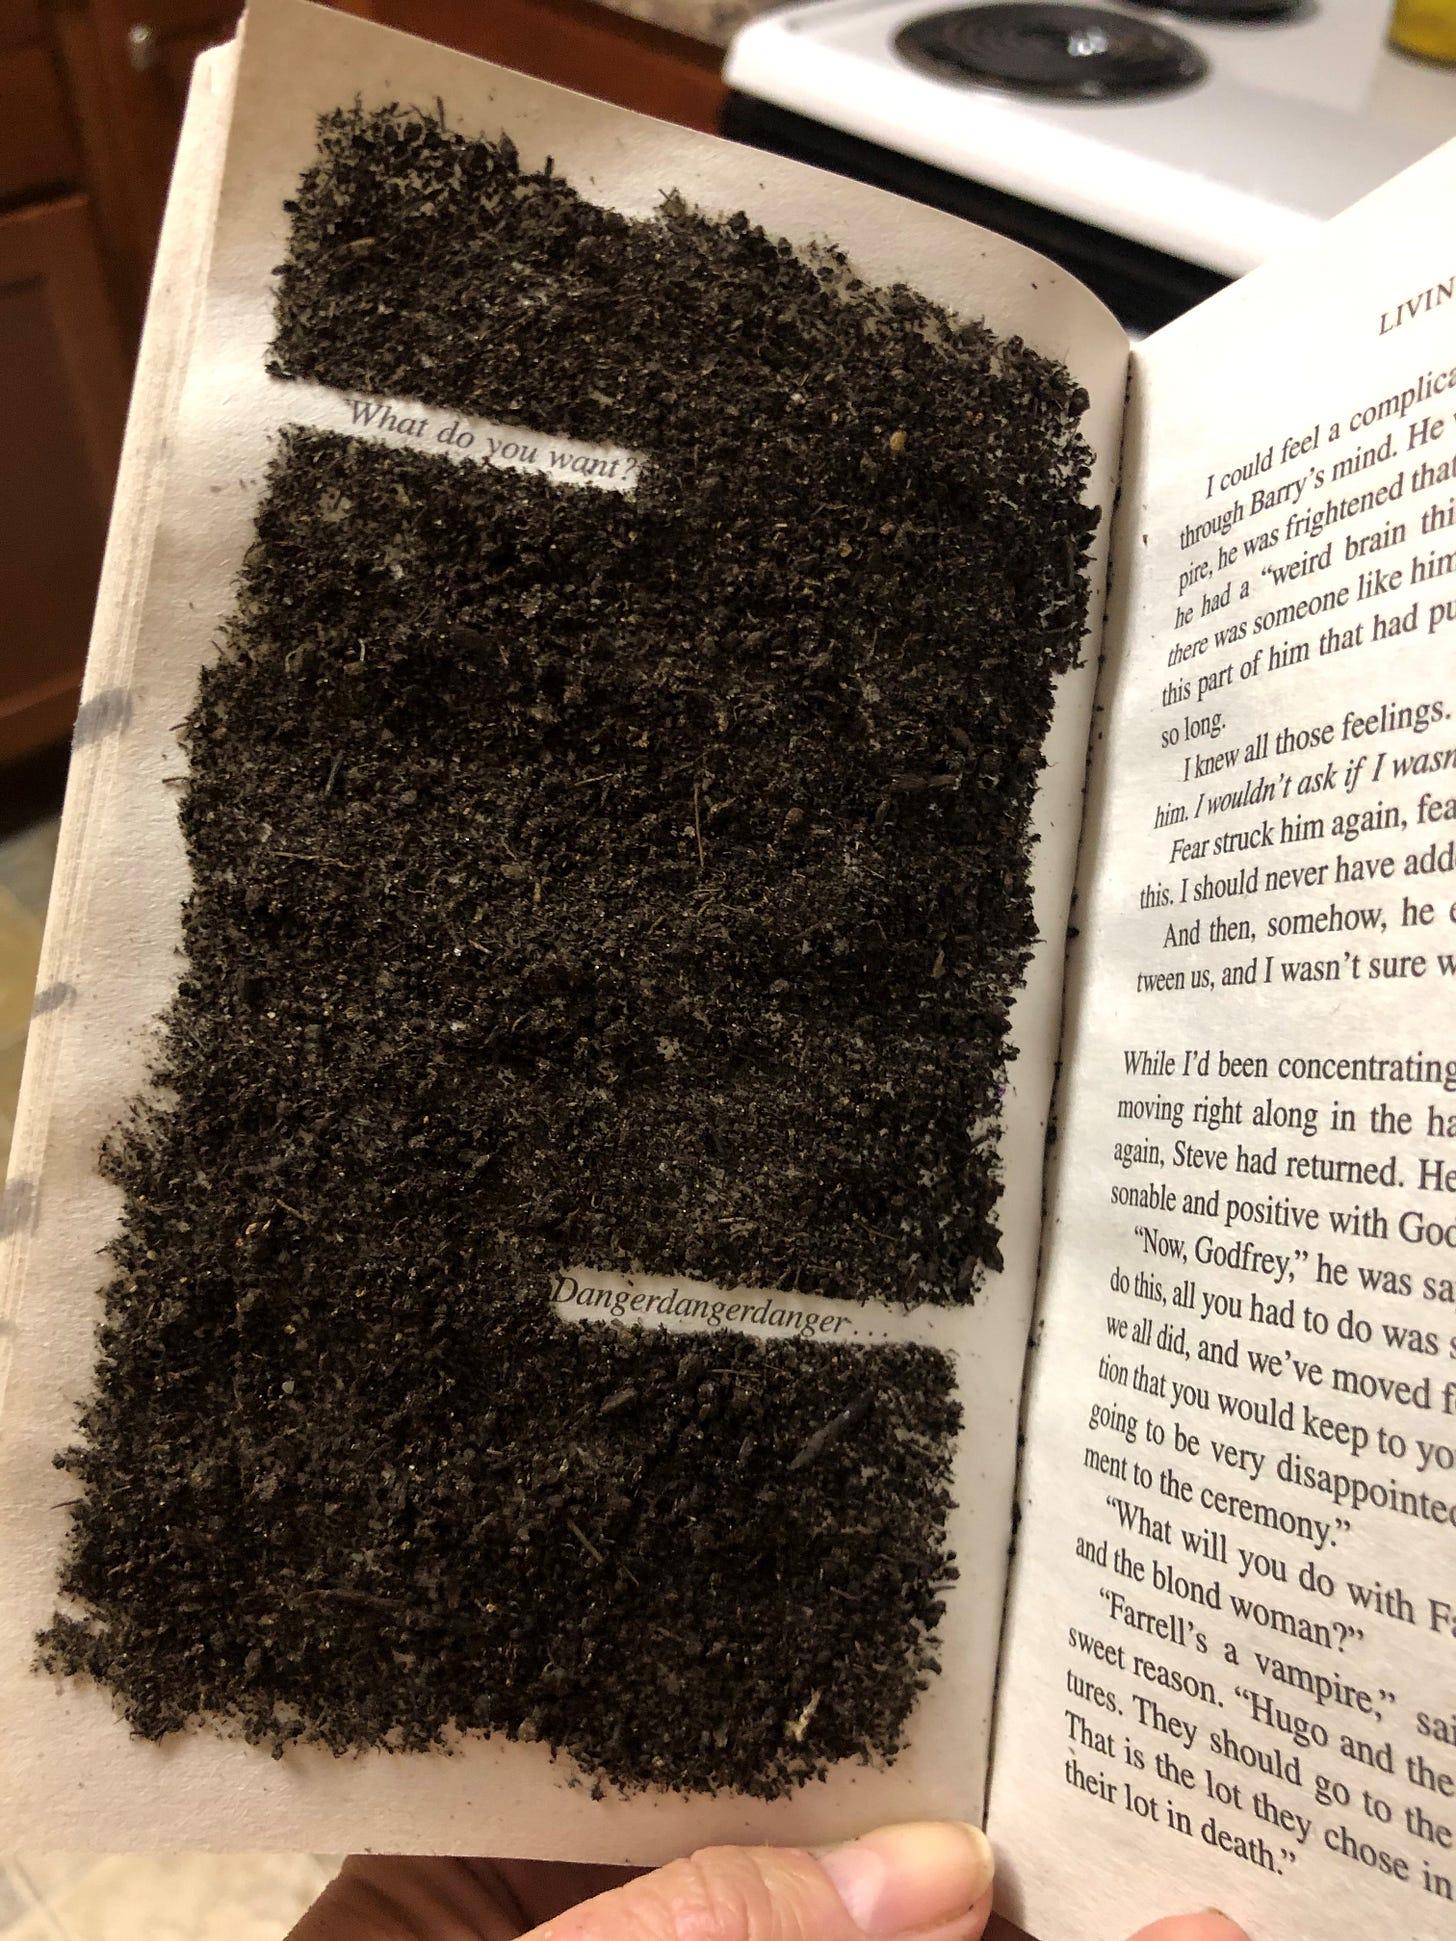 An erasure using dirt made by Caitlin Cowan (Source text: Charlaine Harris' book, Living Dead in Dallas)